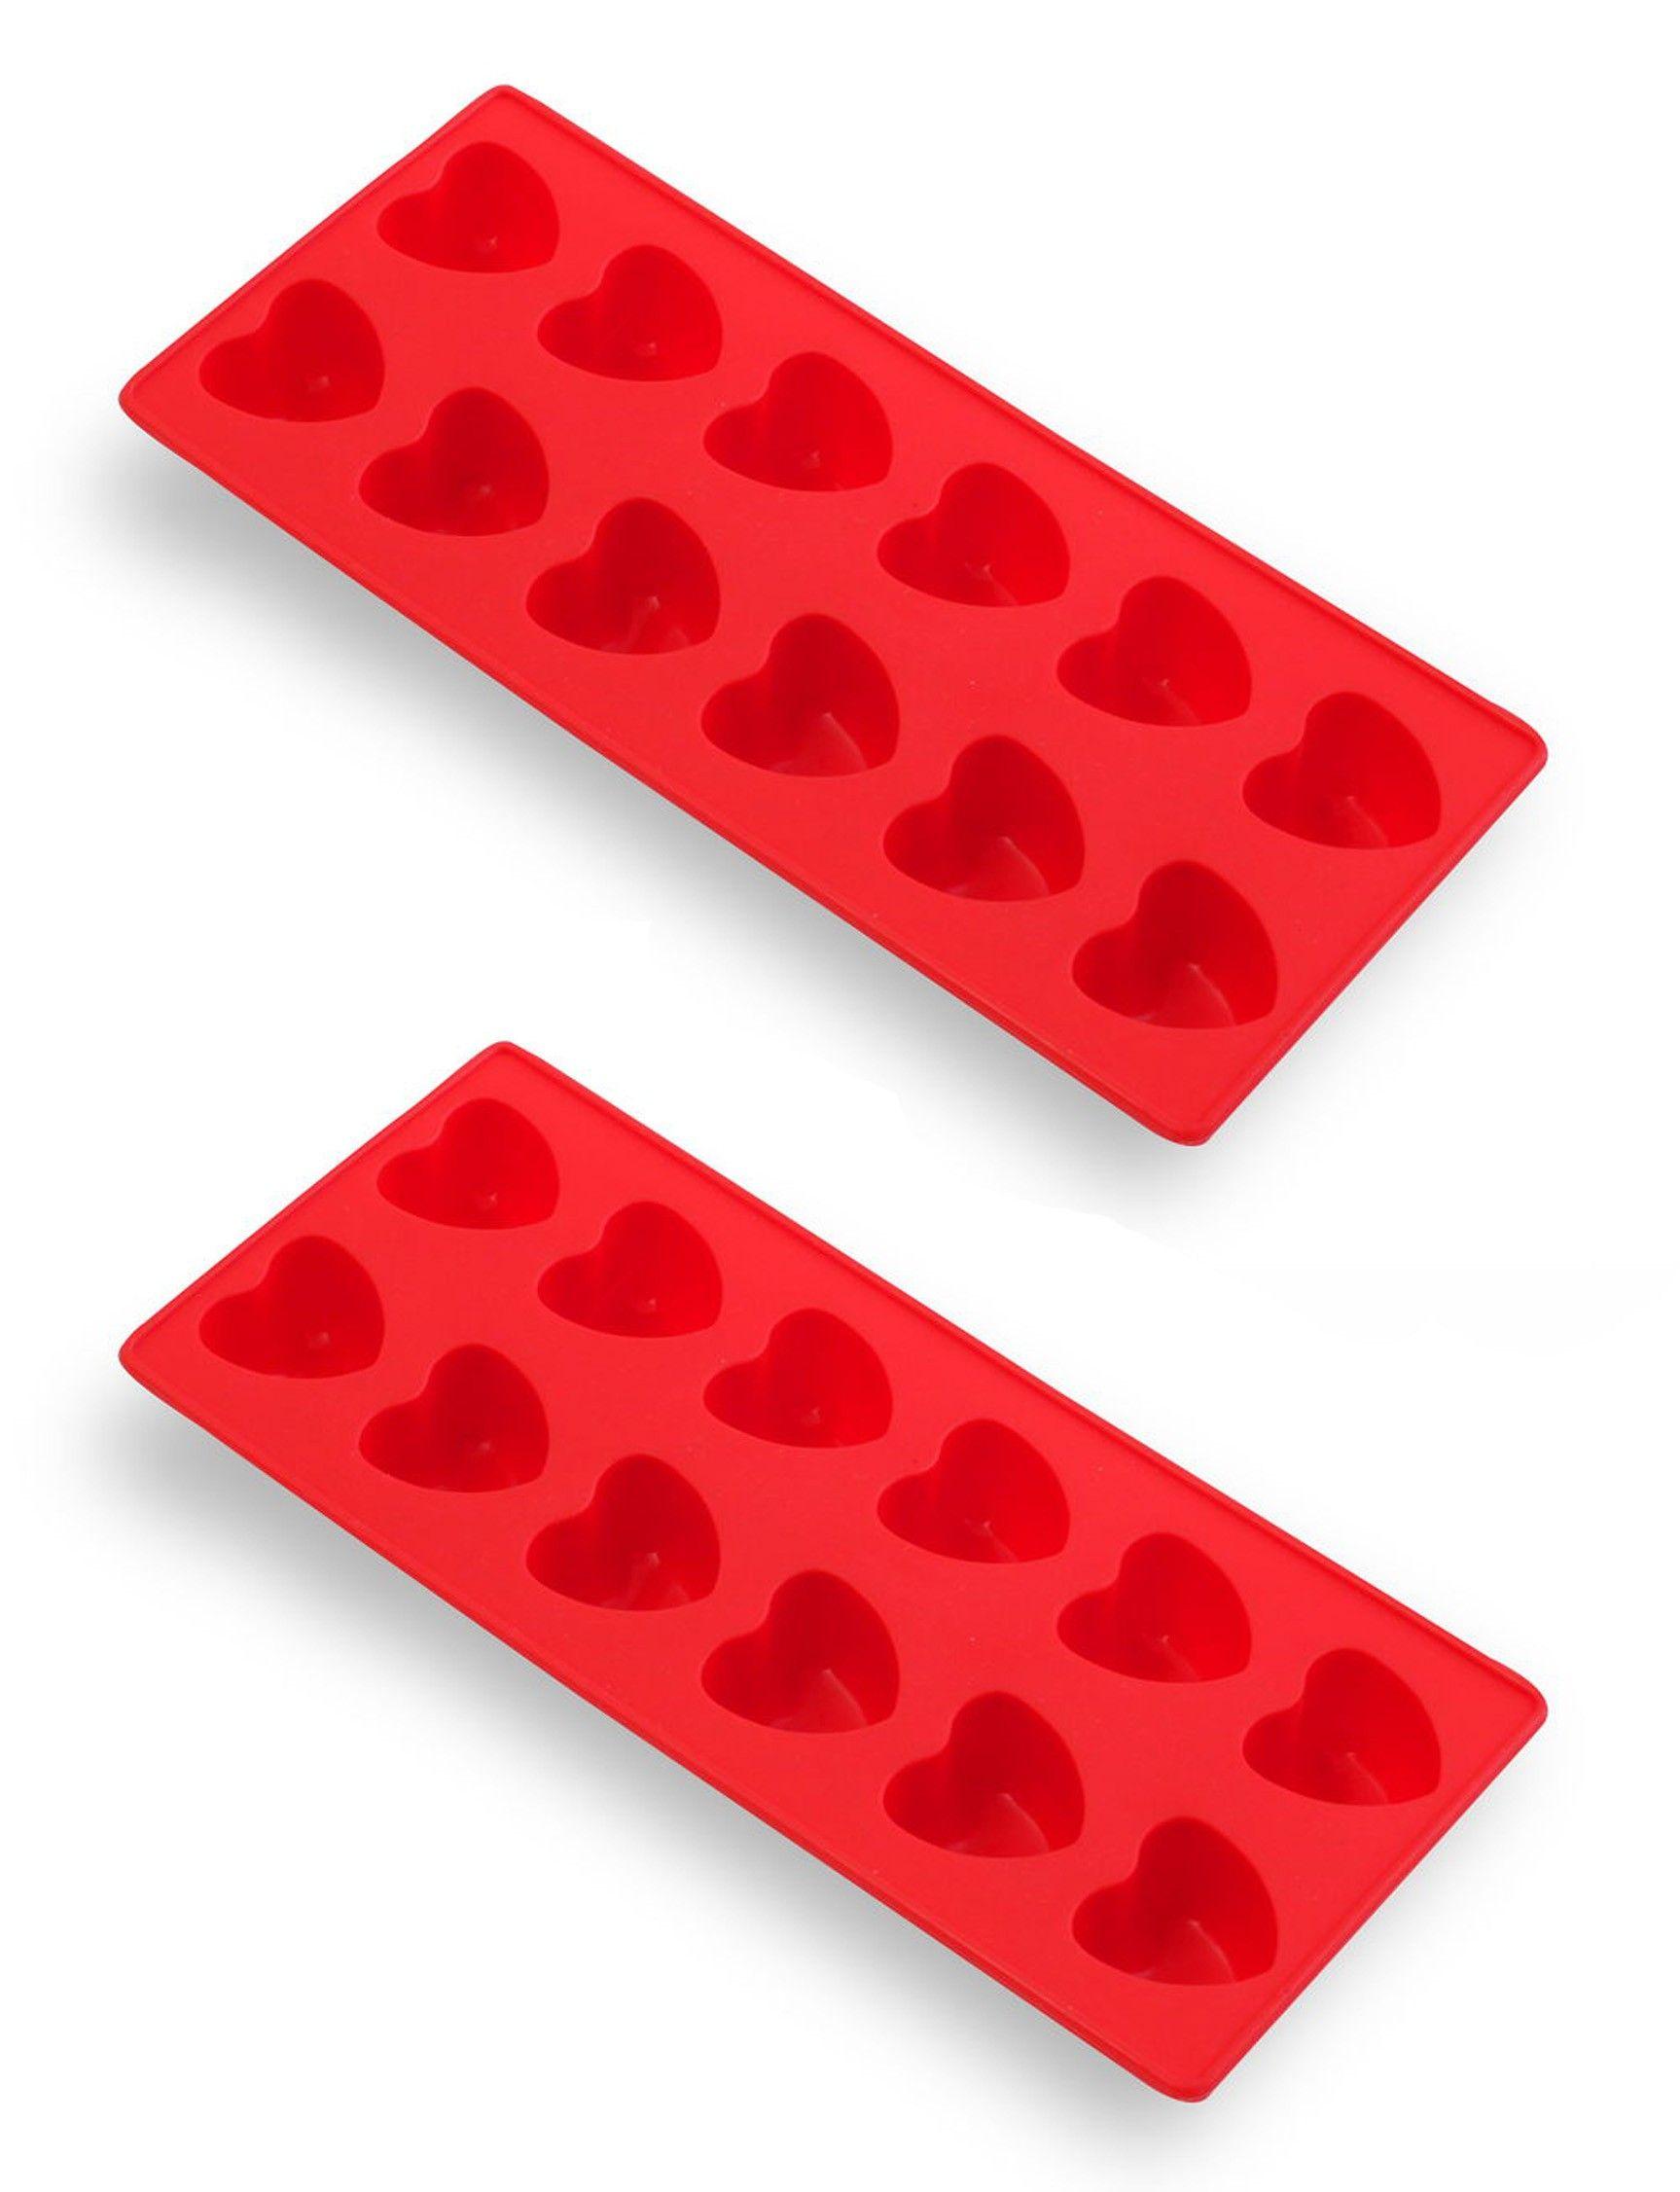 Hearts Ice Cube Mould Set (2 pieces) - Vialli Design